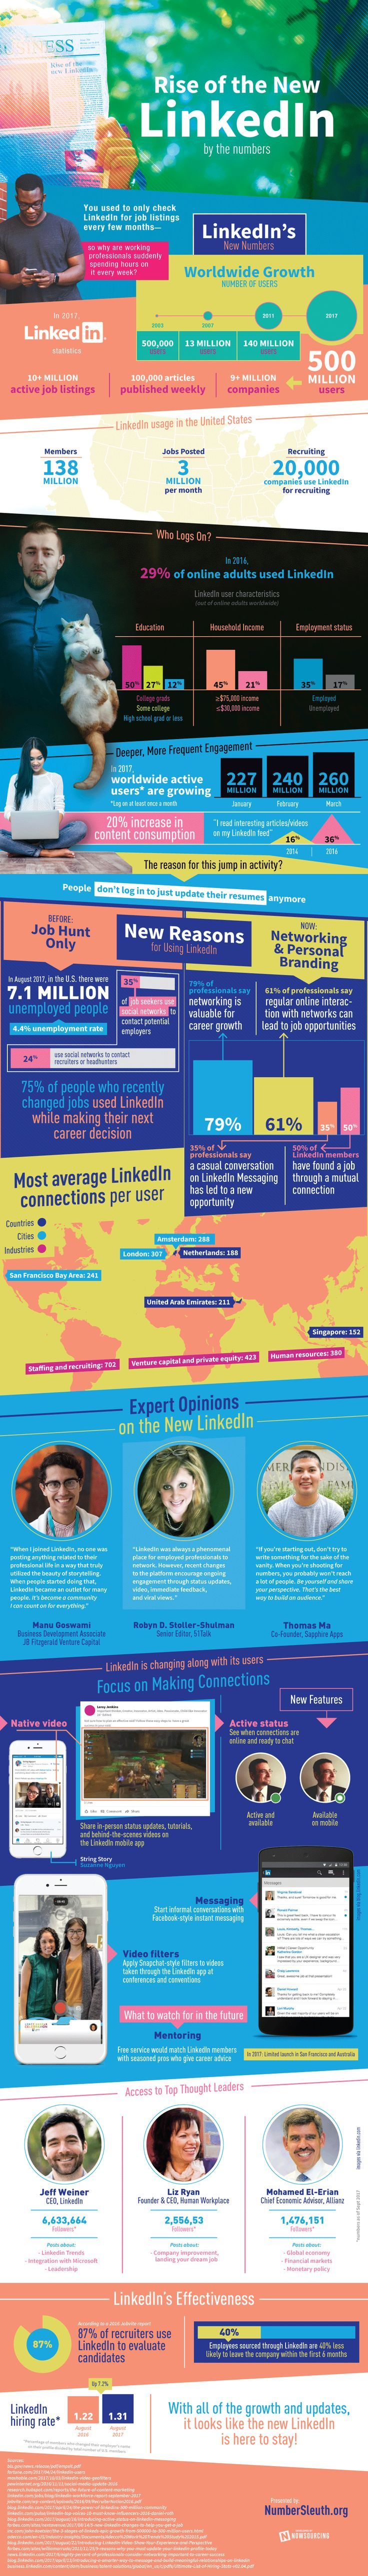 Como trabaja LinkedIn infografia infographic